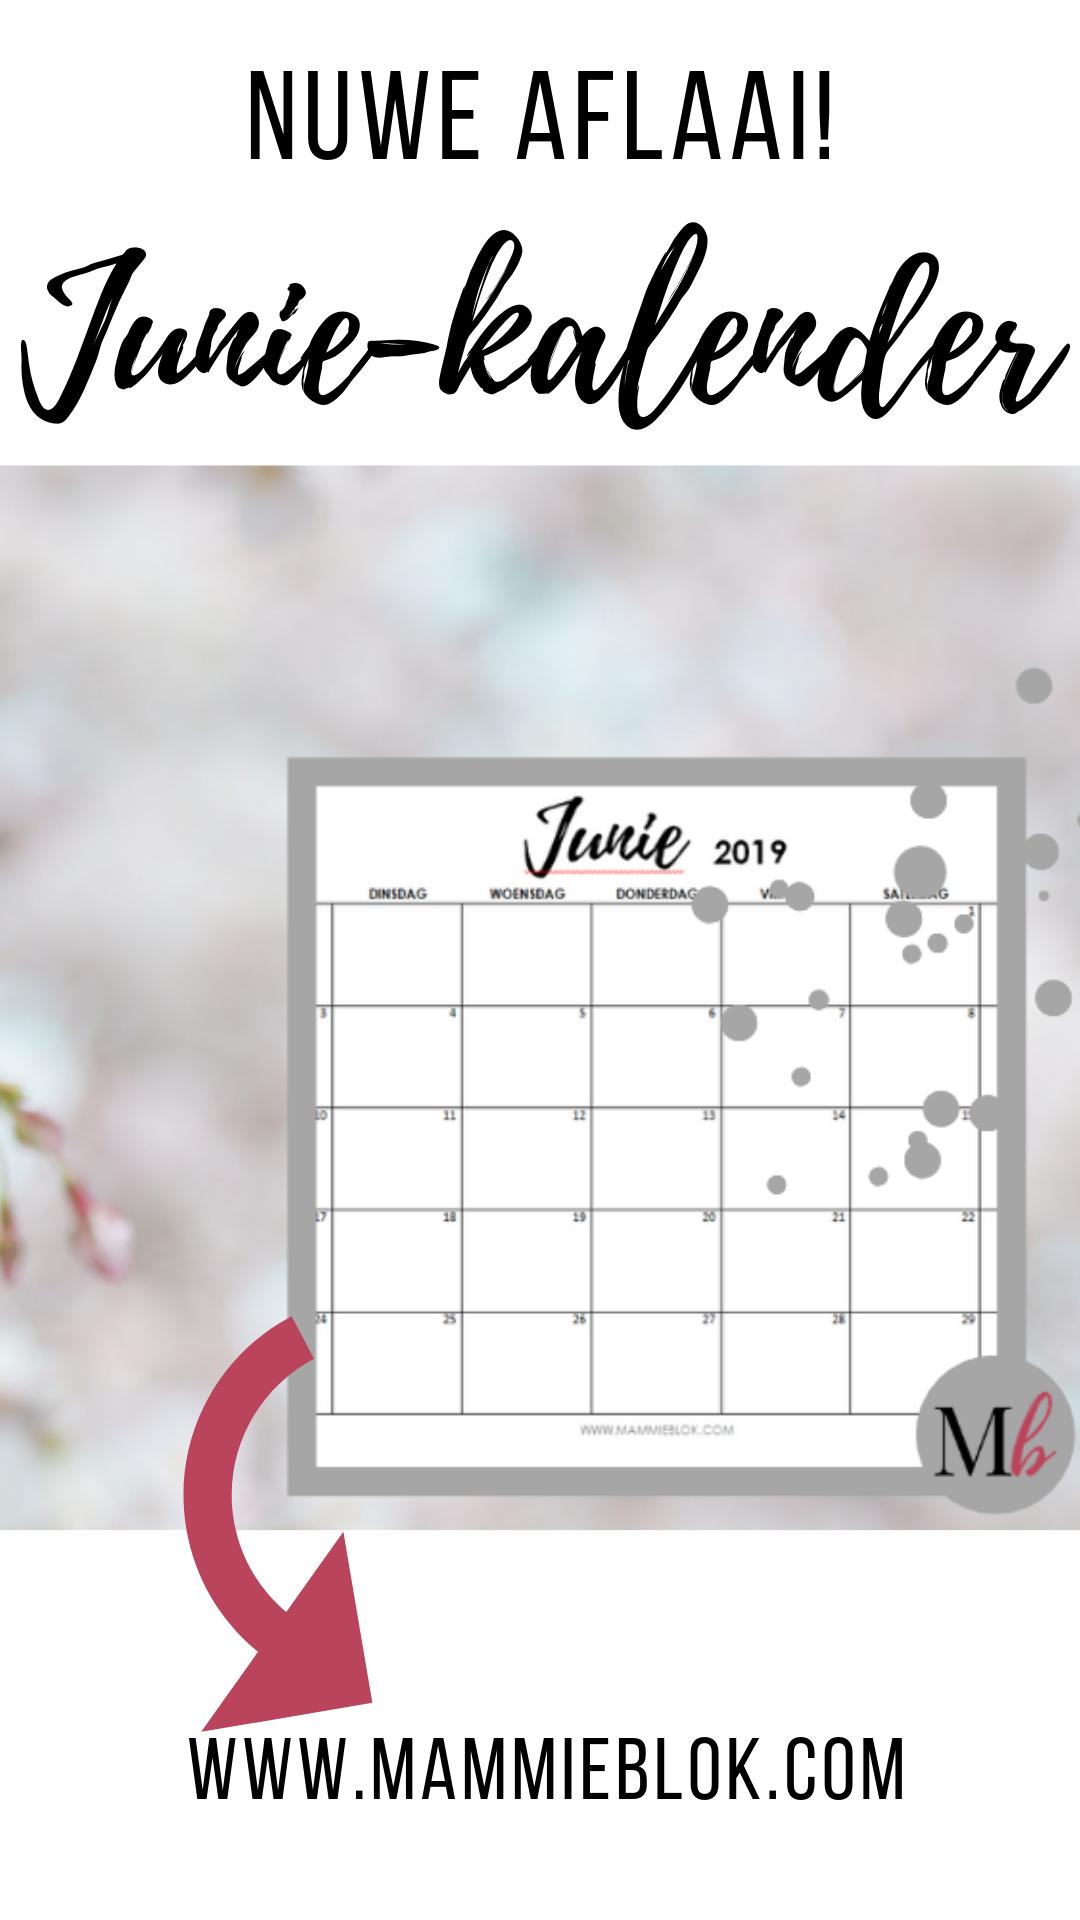 Junie 2019 Gratis Aflaai Calendar Gratis Free Printables